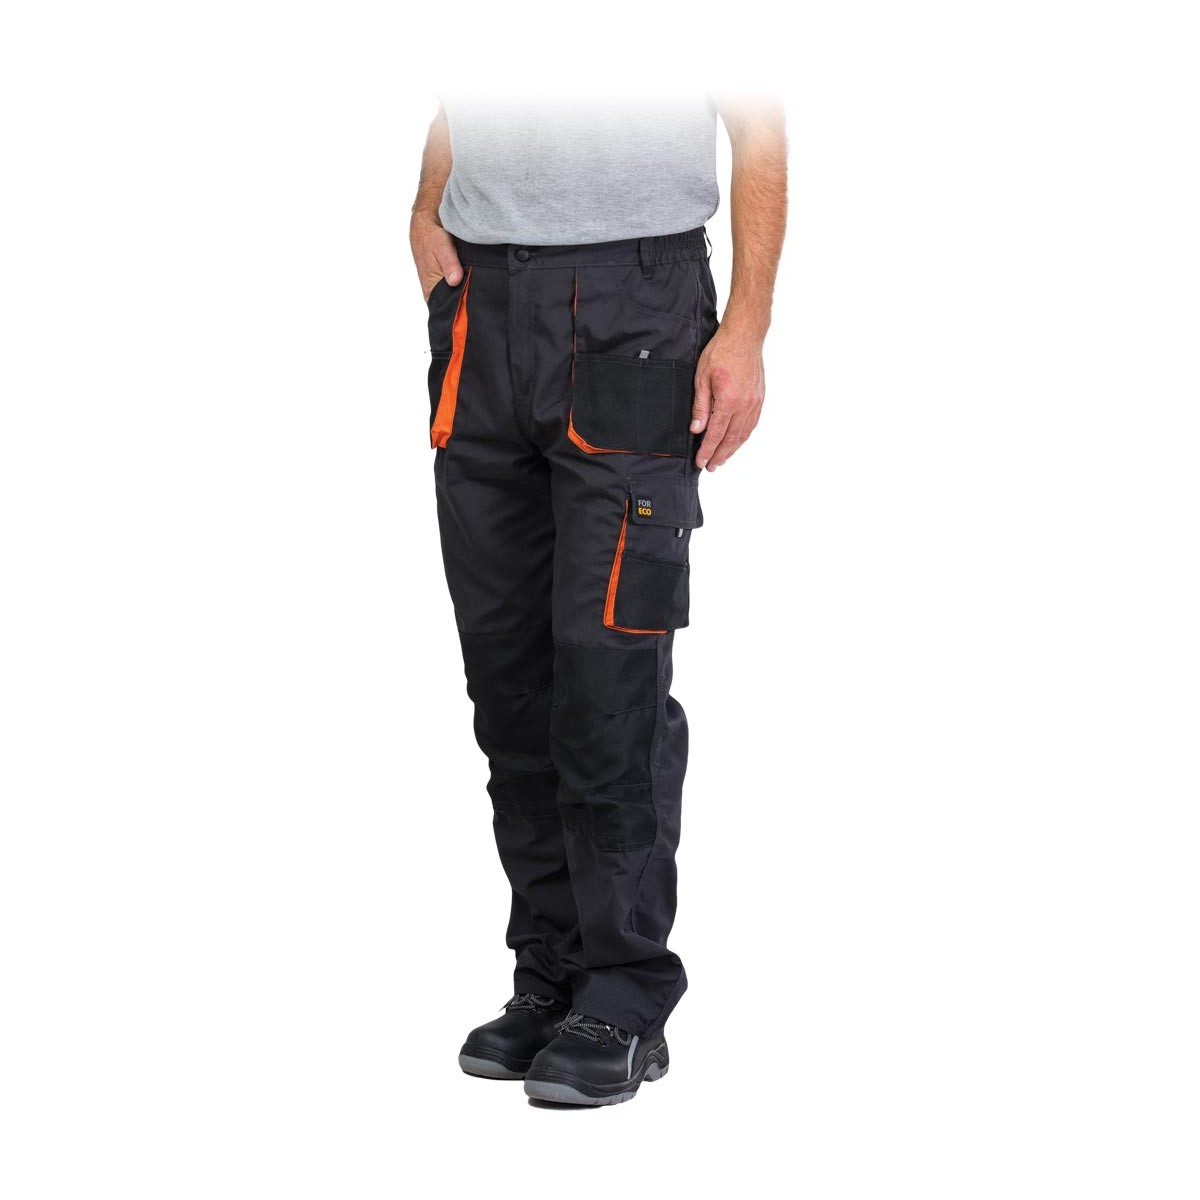 Spodnie robocze FORECO do pasa SBP r. 46 - 62